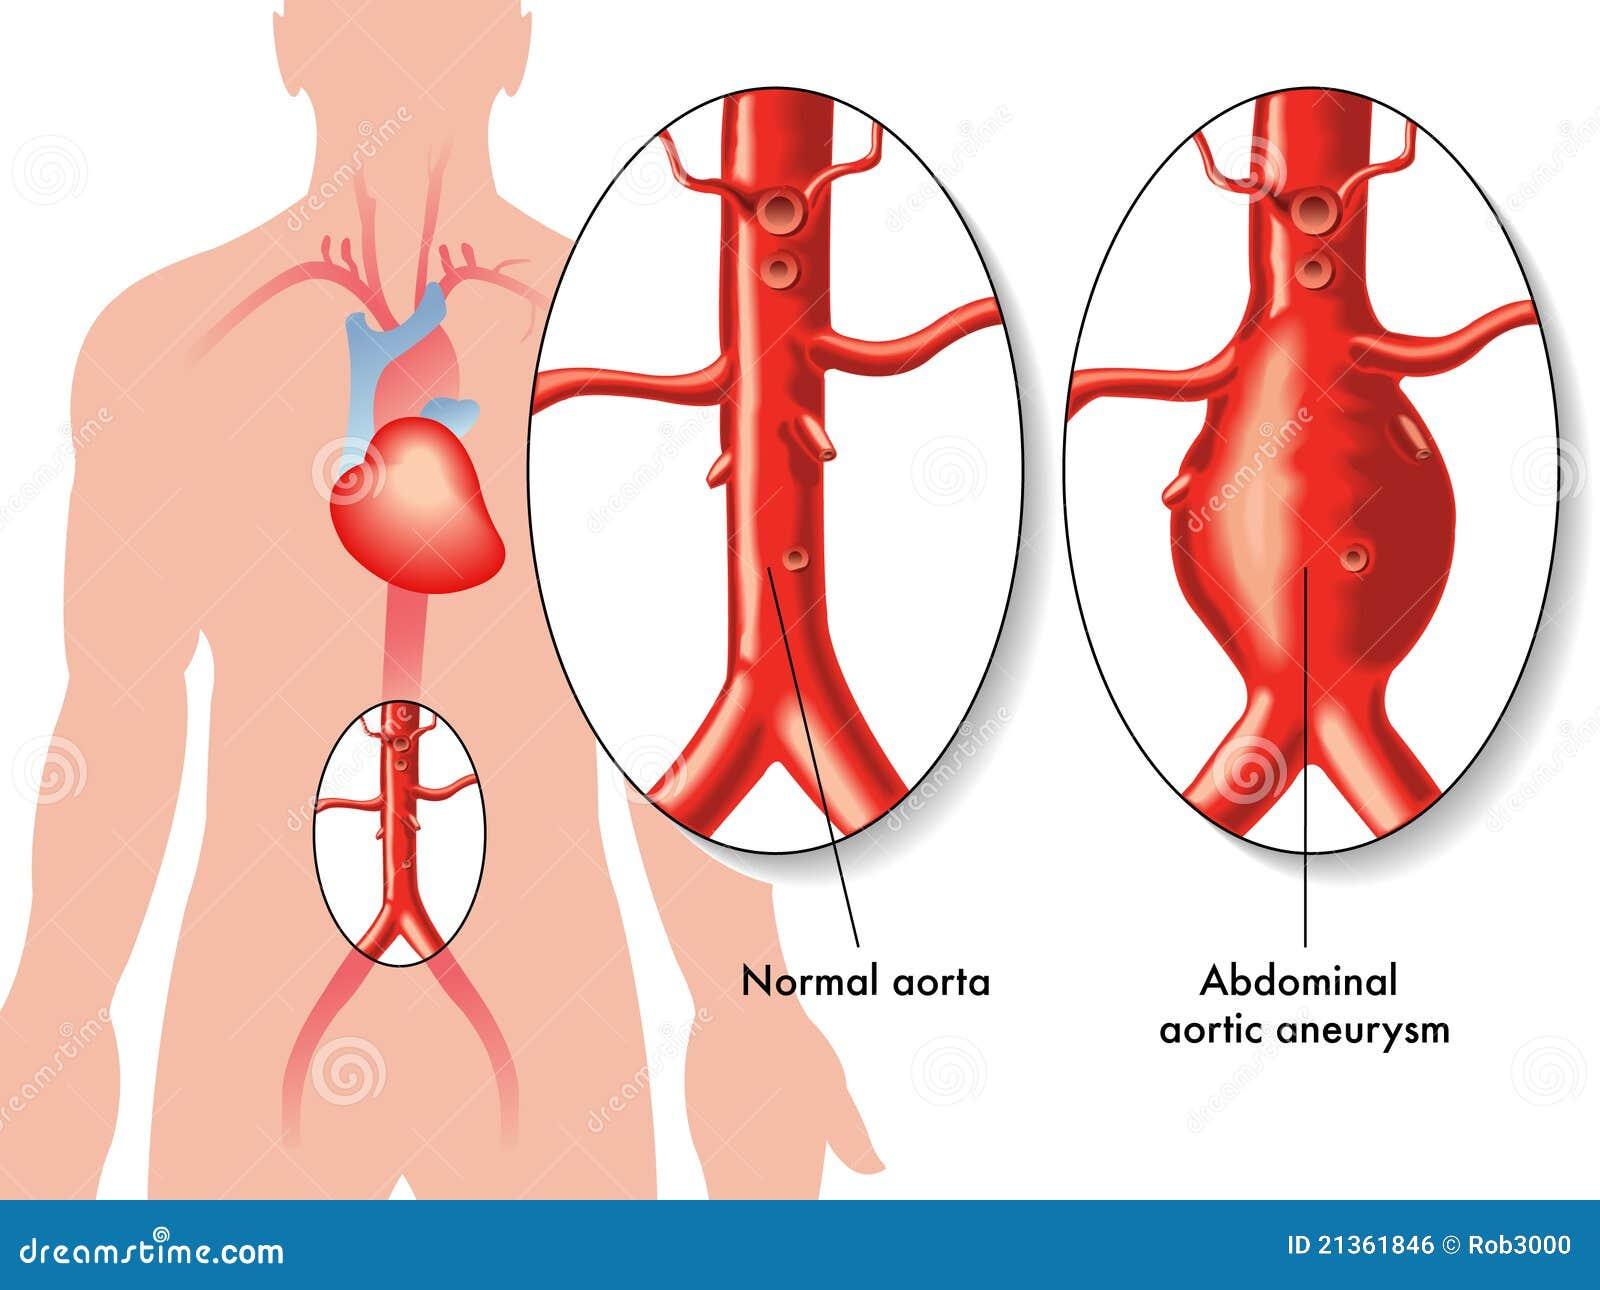 Buik aortaaneurisma